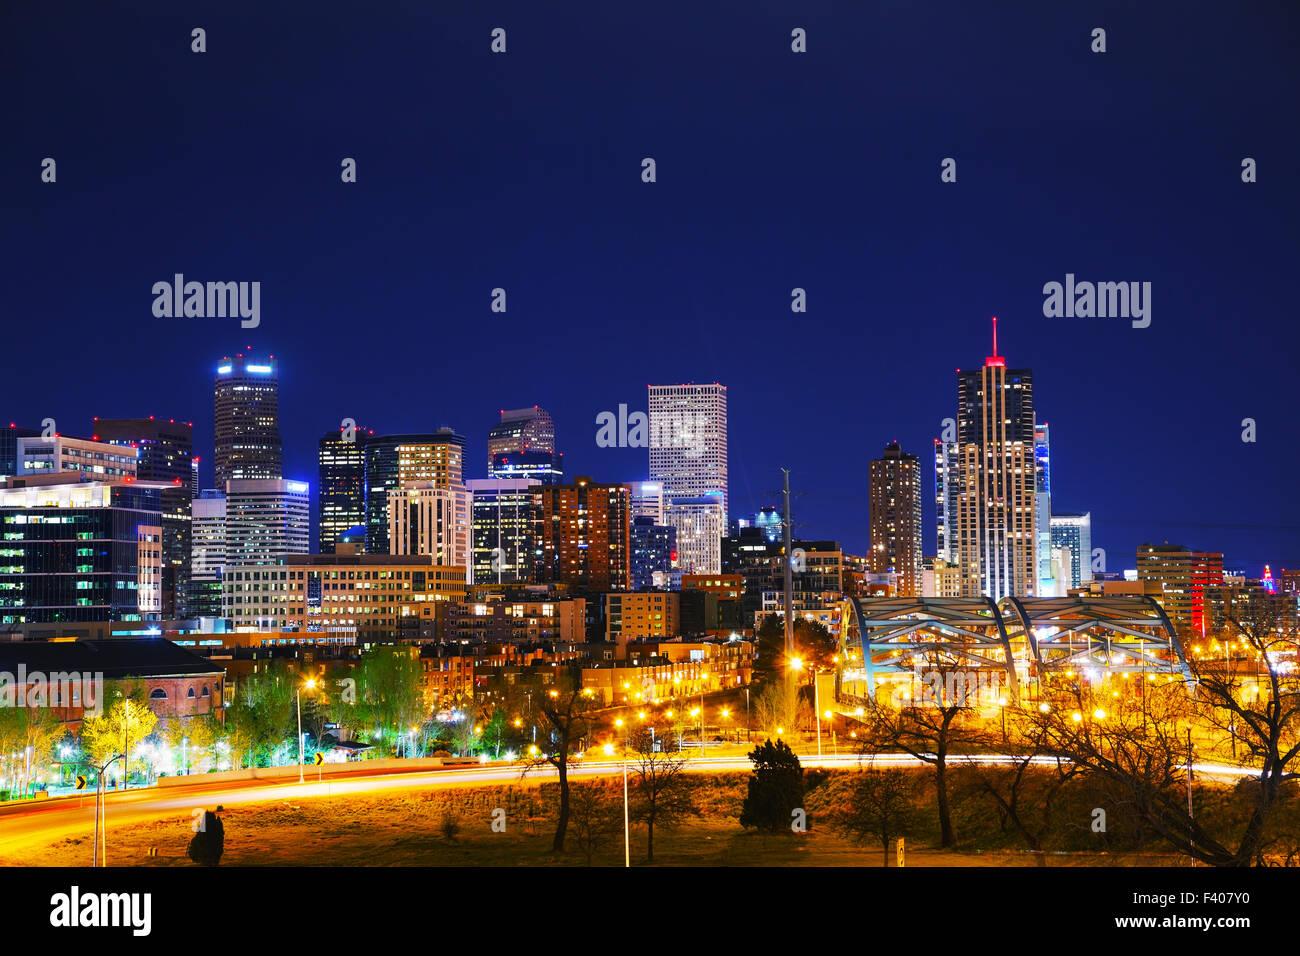 Downtown Denver, Colorado - Stock Image